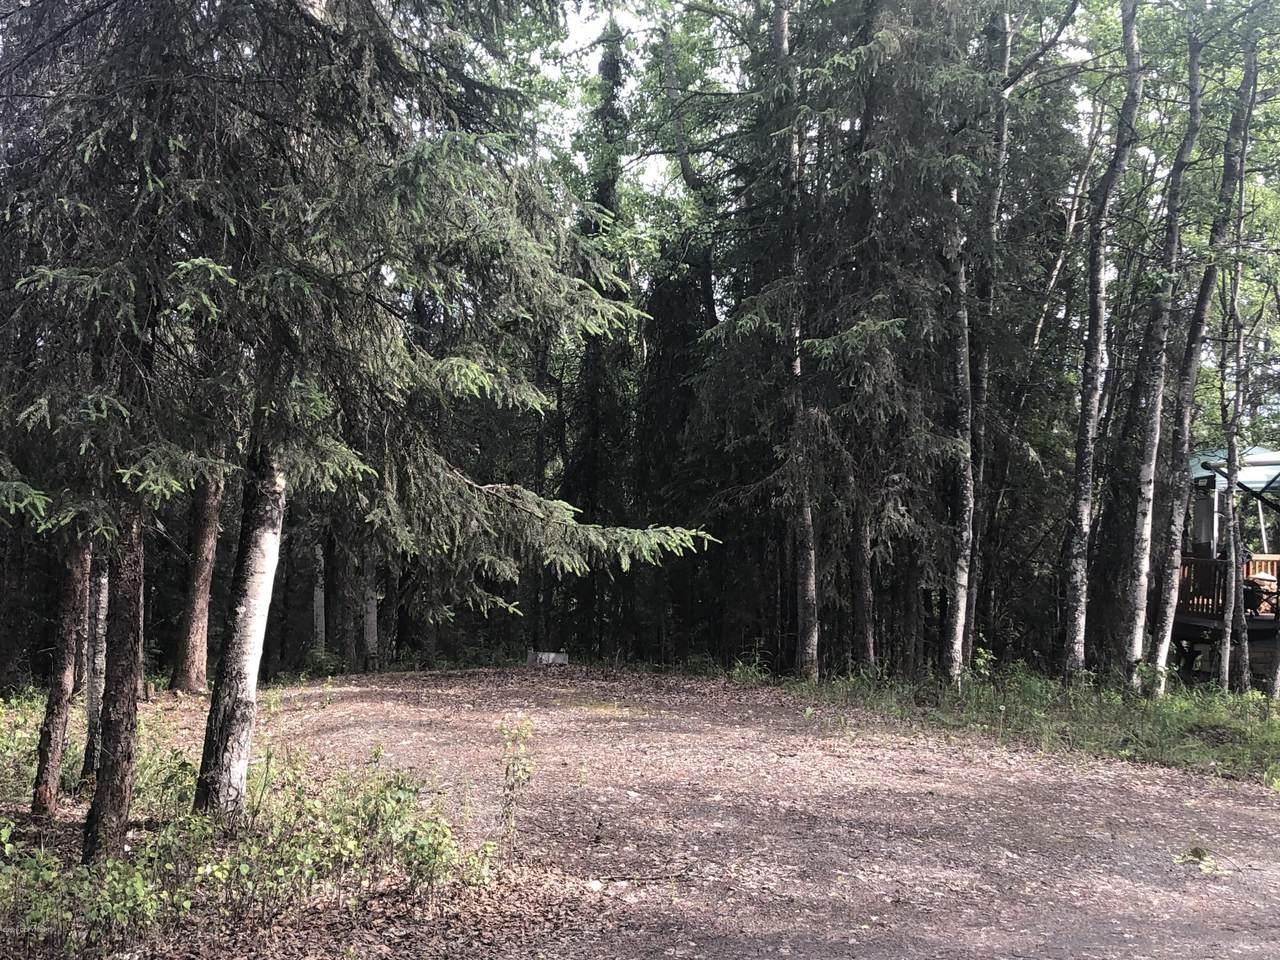 https://bt-photos.global.ssl.fastly.net/alaska/1280_boomver_1_20-9877-2.jpg